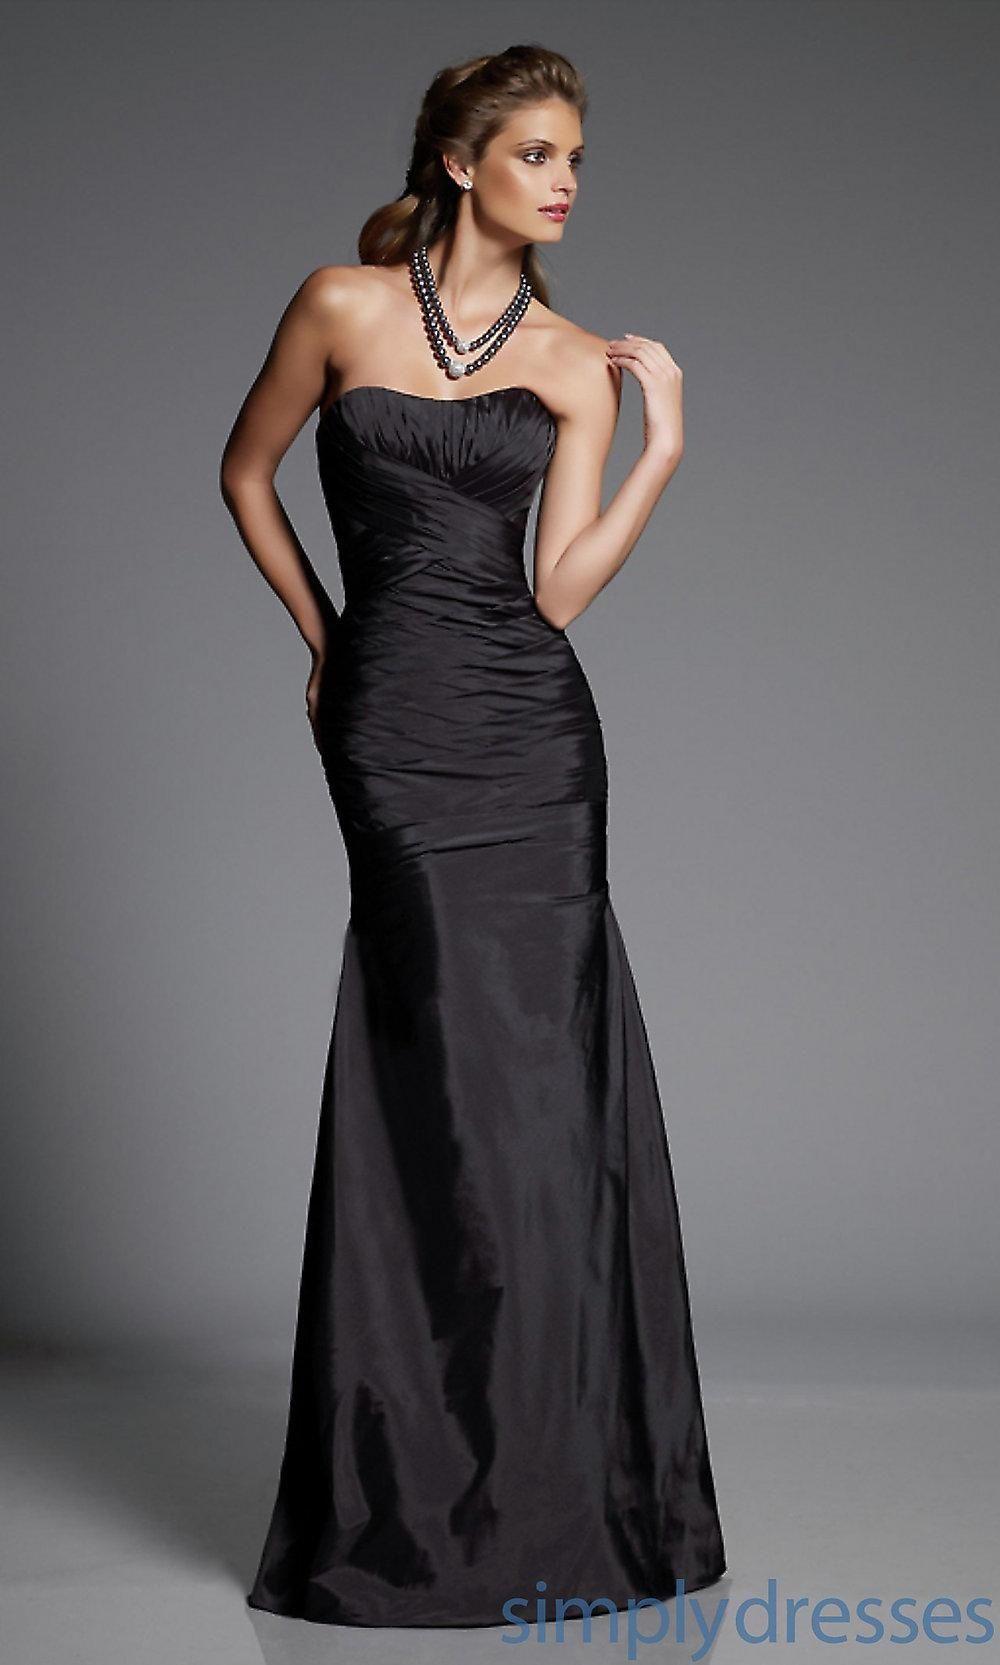 Strapless Silk Taffeta Bridesmaid Dress By Mori Lee Brought To You Avarsha